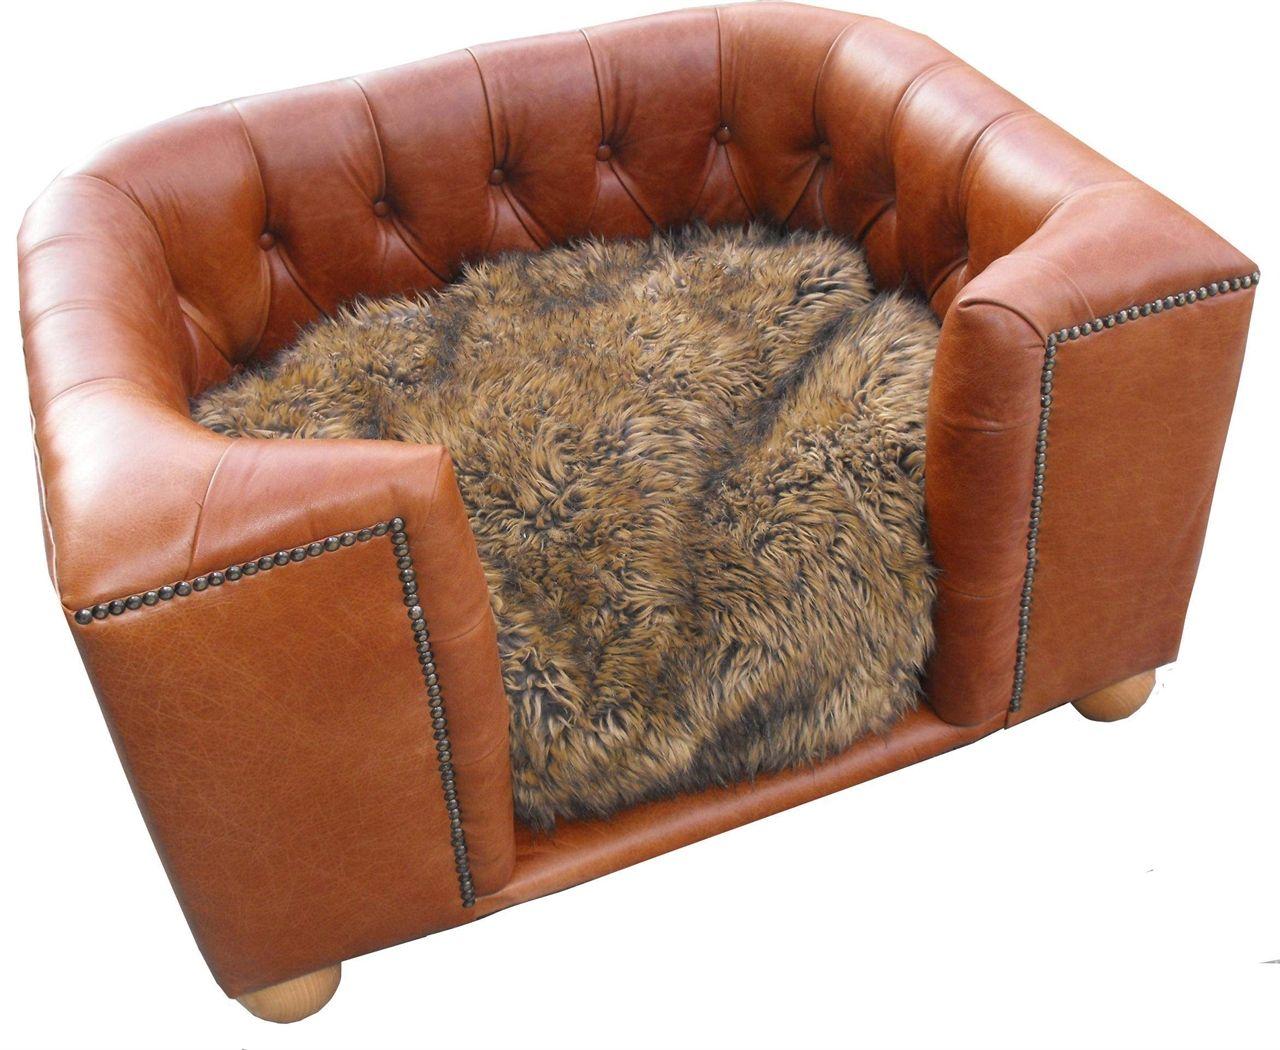 Pink Whiskers Luxury Bespoke Pet Furniture Luxury Leather Dog Beds Dog Bed Luxury Dog Bed Leather Dog Bed